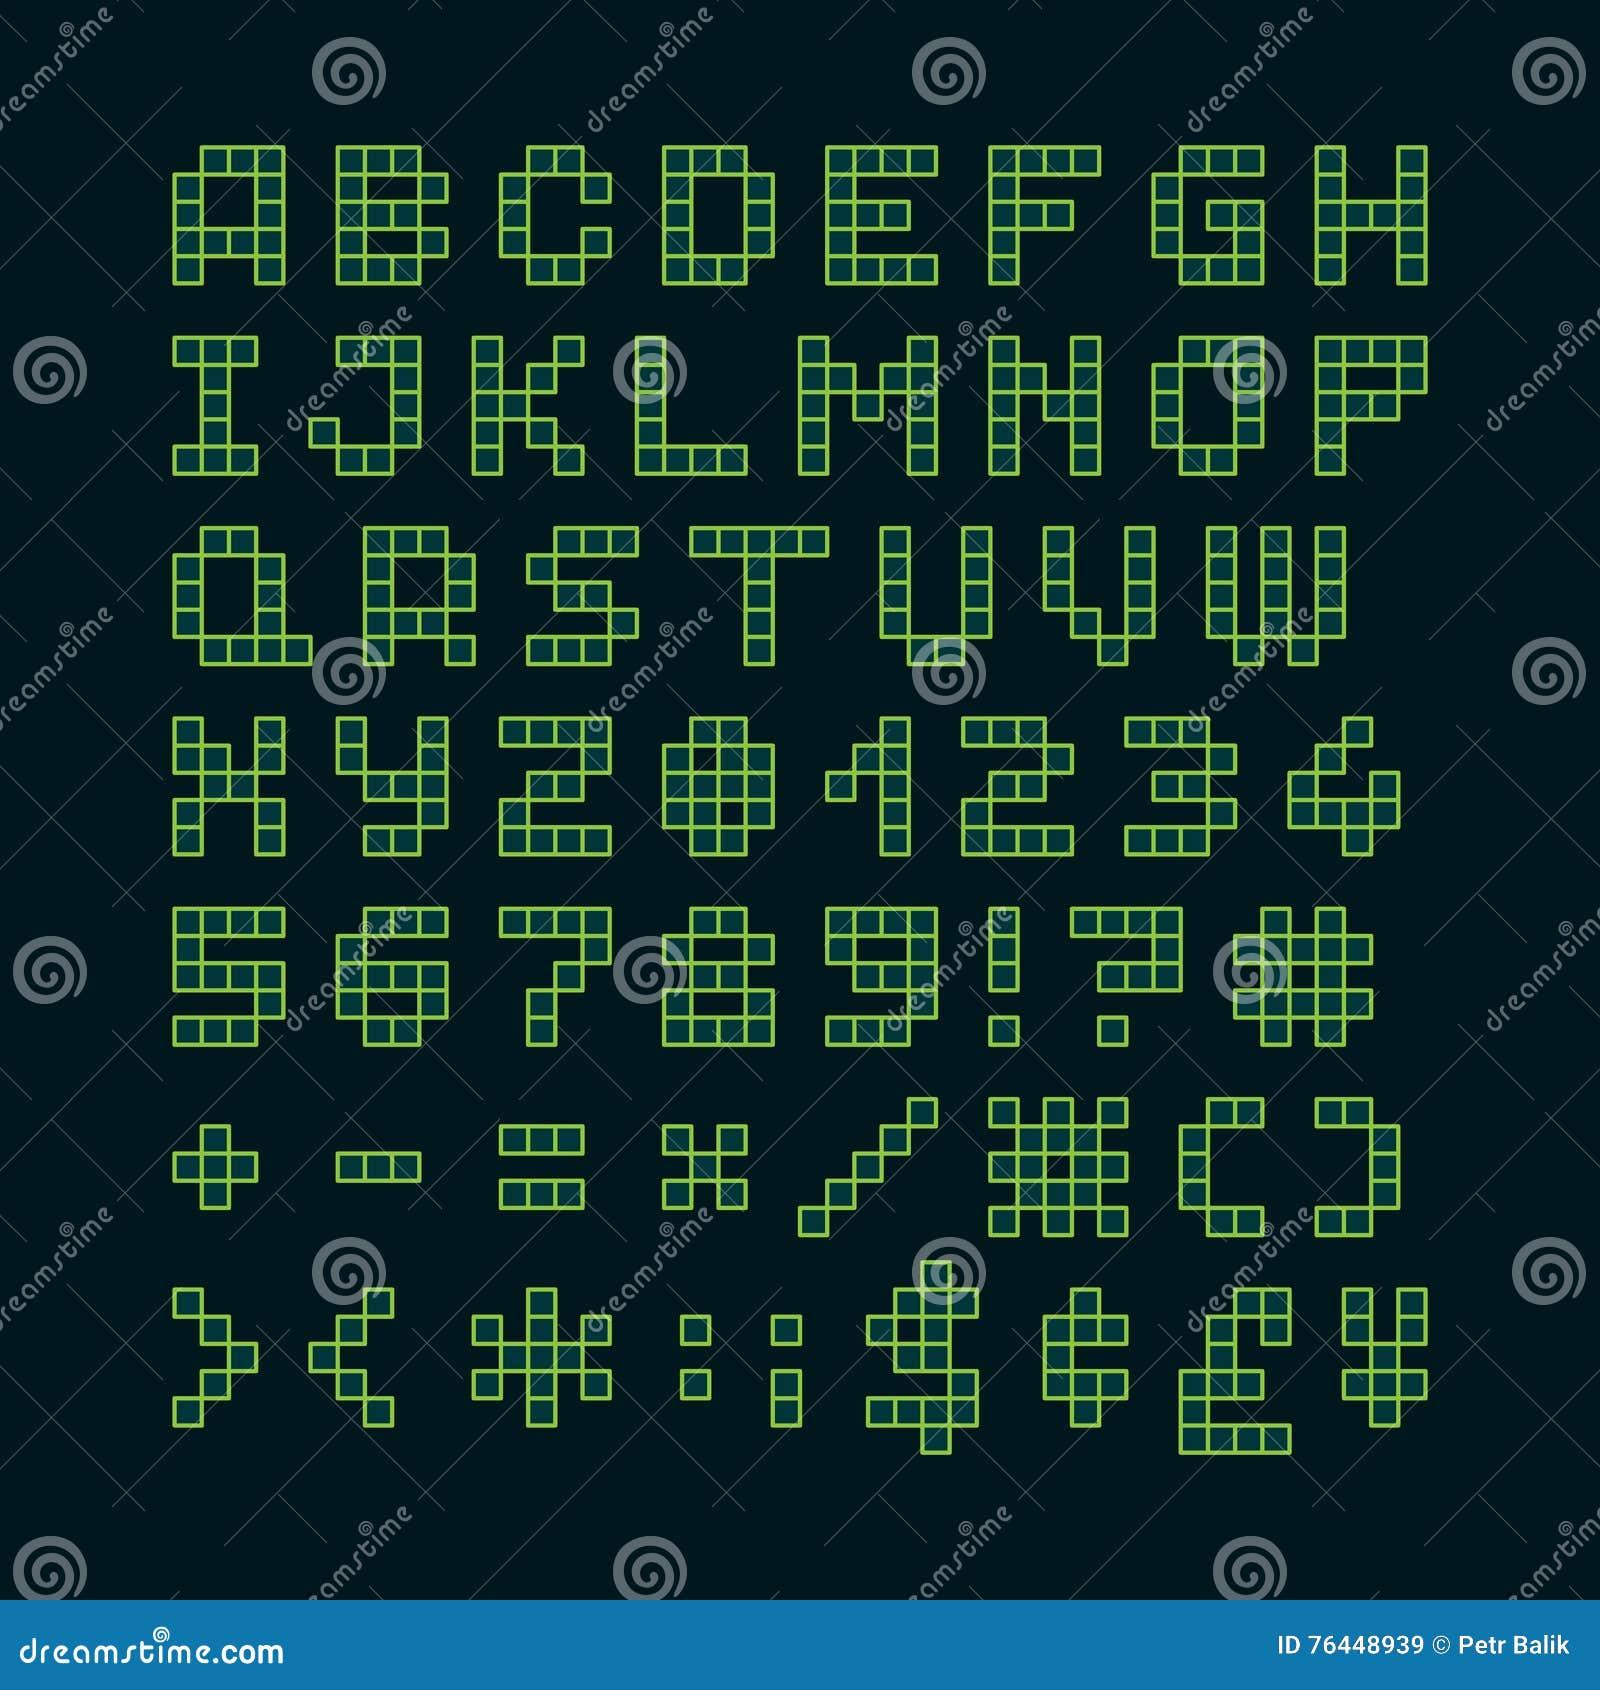 Pixel Font In 4x5 Pixel Grid Stock Vector - Illustration of